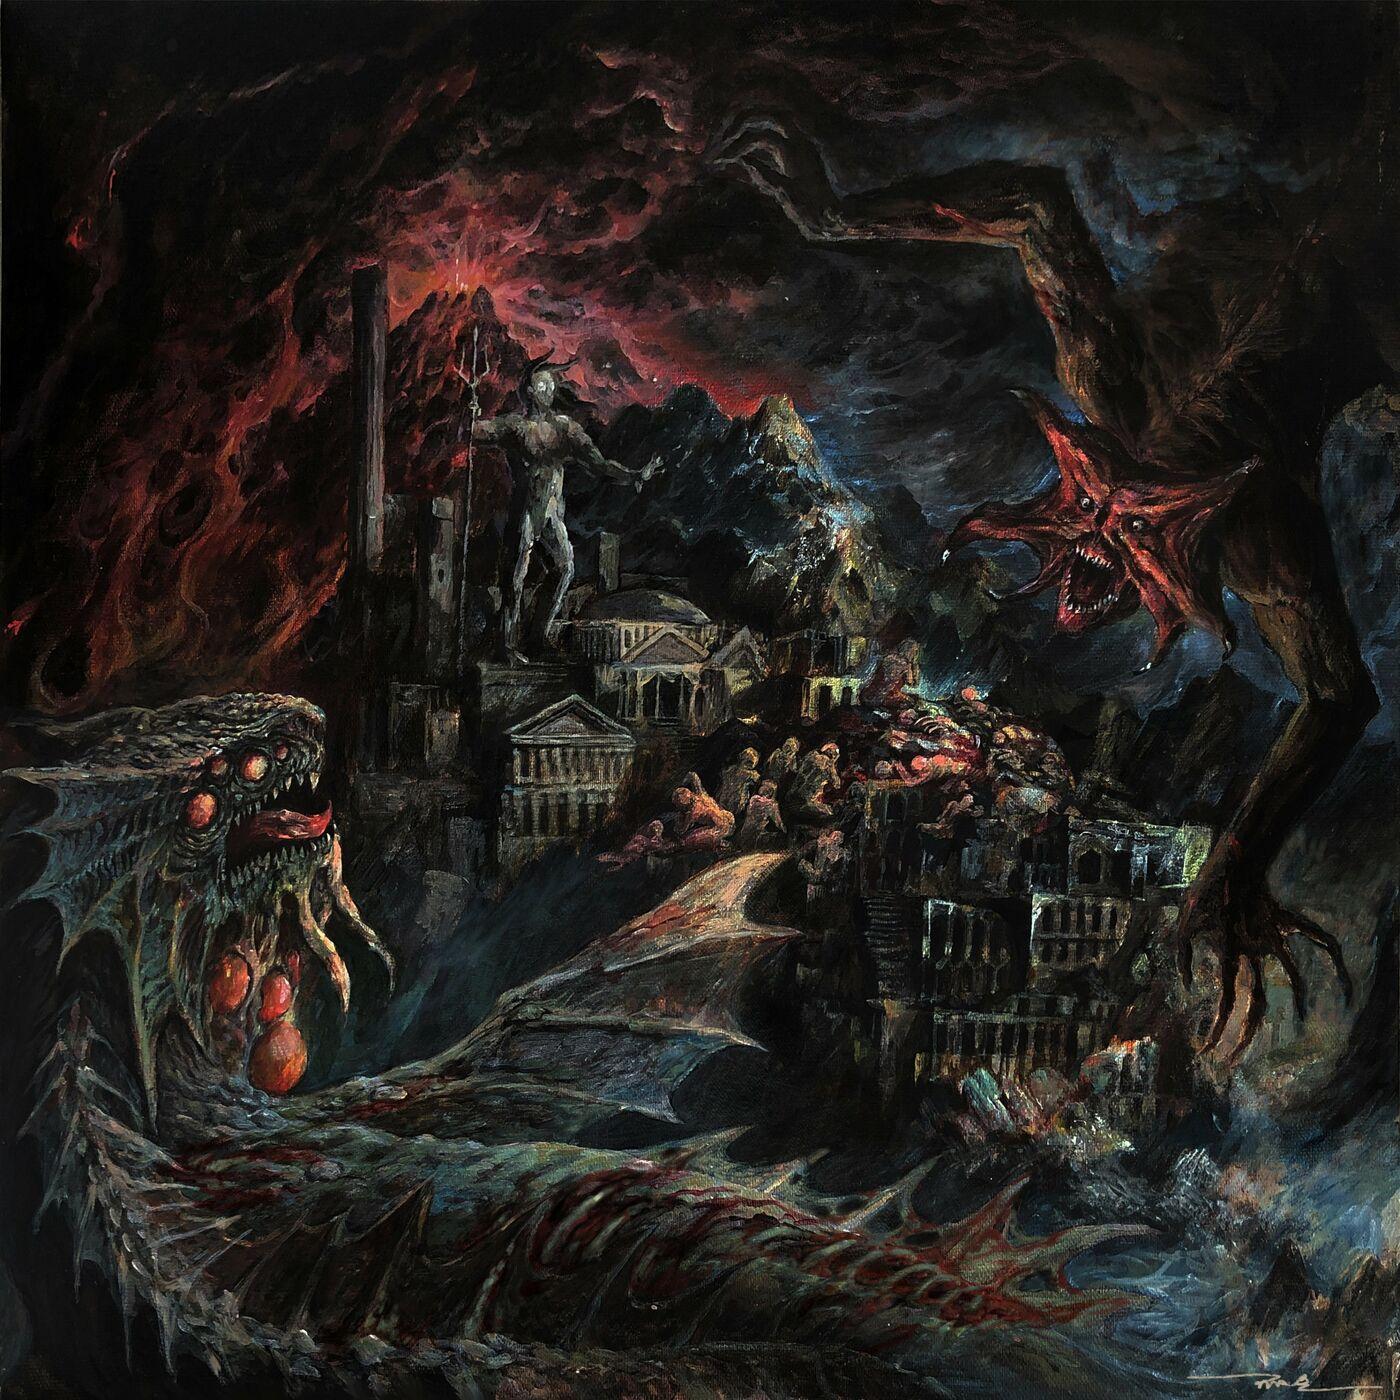 Leviathan - Revenge The Throne Of Tyranny [single] (2020)